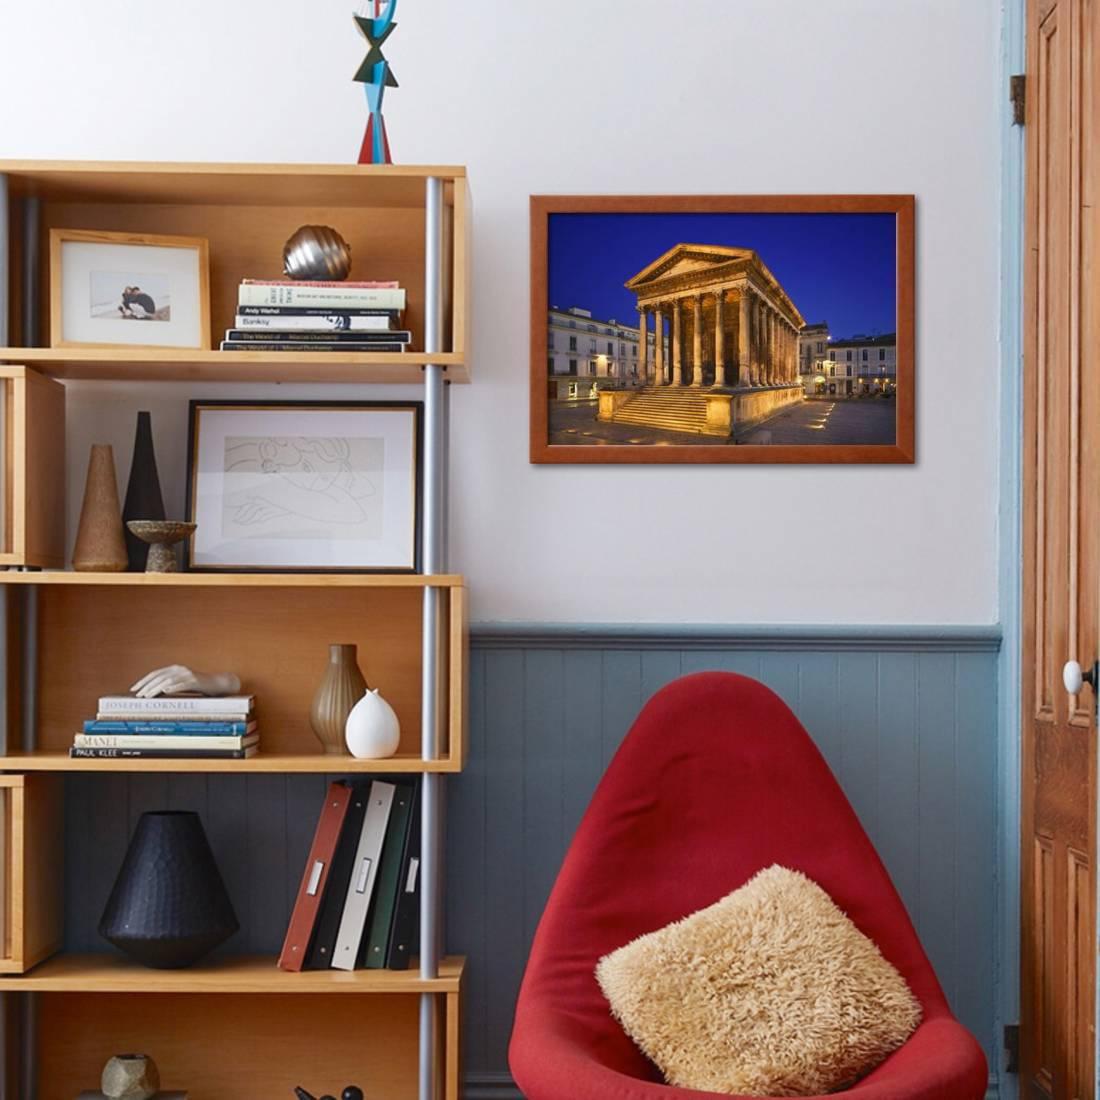 Maison Carree at Dusk Framed Print Wall Art By Jon Hicks